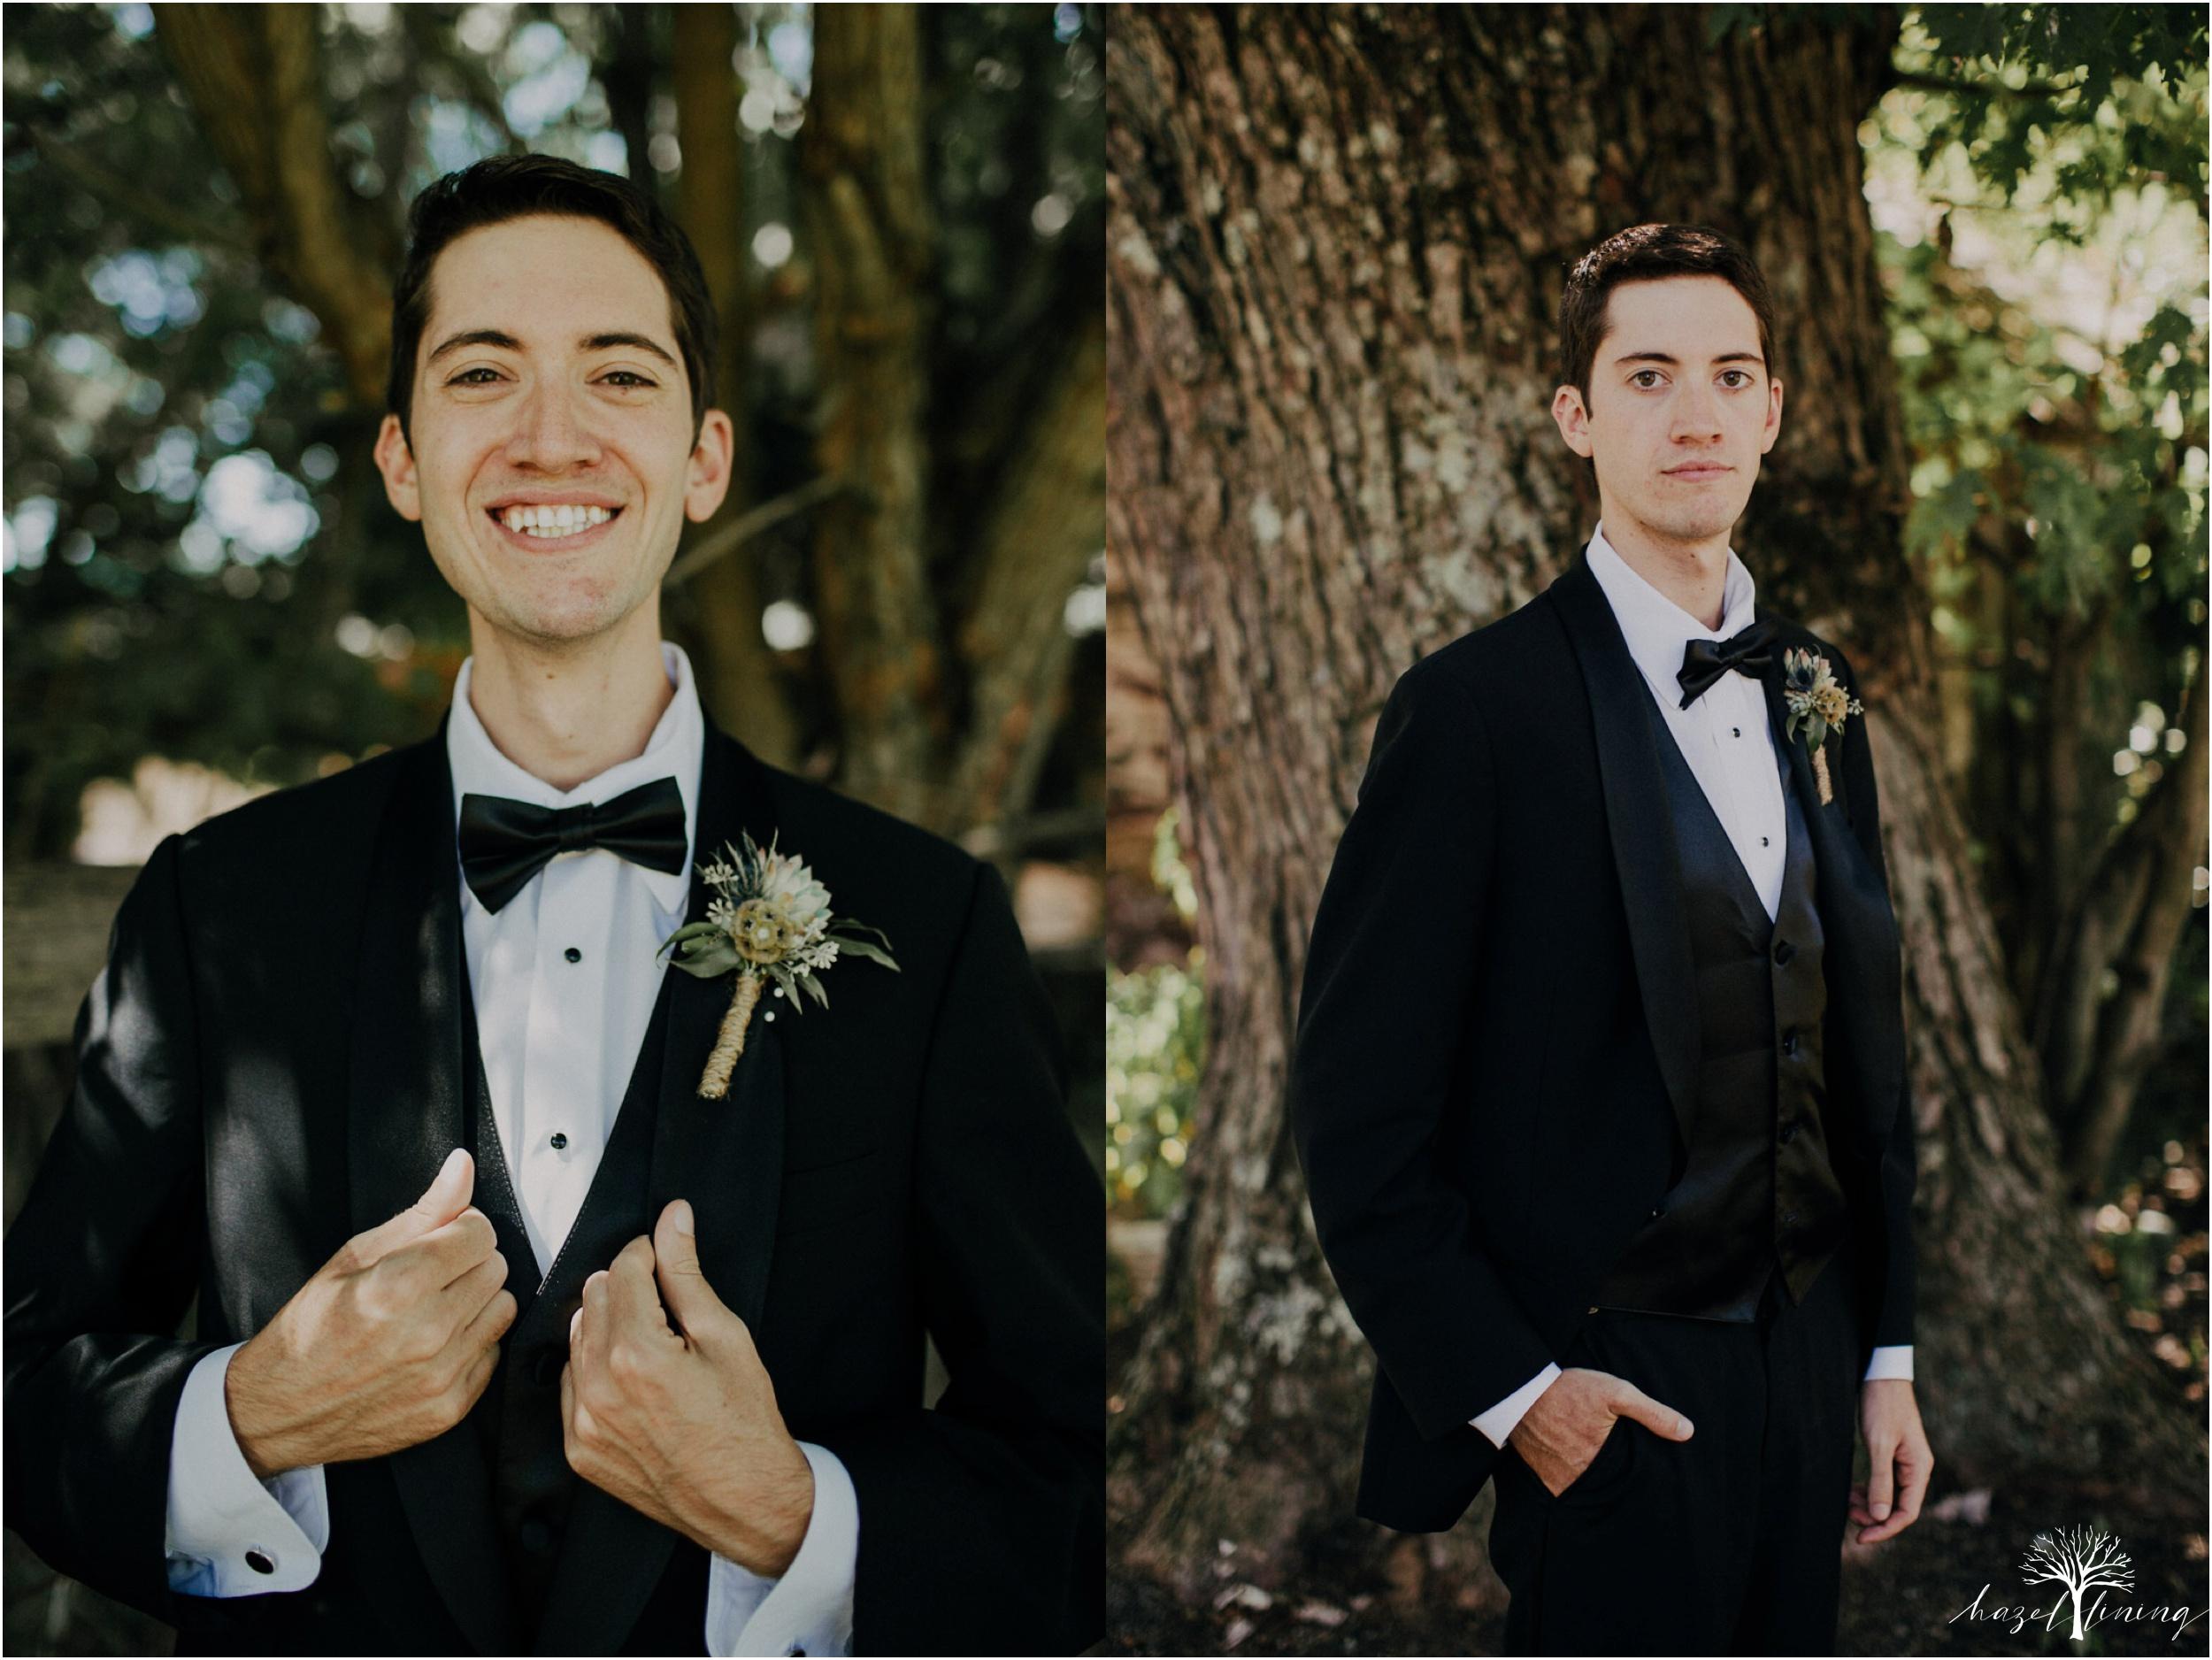 maureen-hepner-anthony-giordano-rose-bank-winery-newtow-pennsylvania-luxury-summer-wedding-hazel-lining-photography-destination-elopement-wedding-engagement-photography_0043.jpg